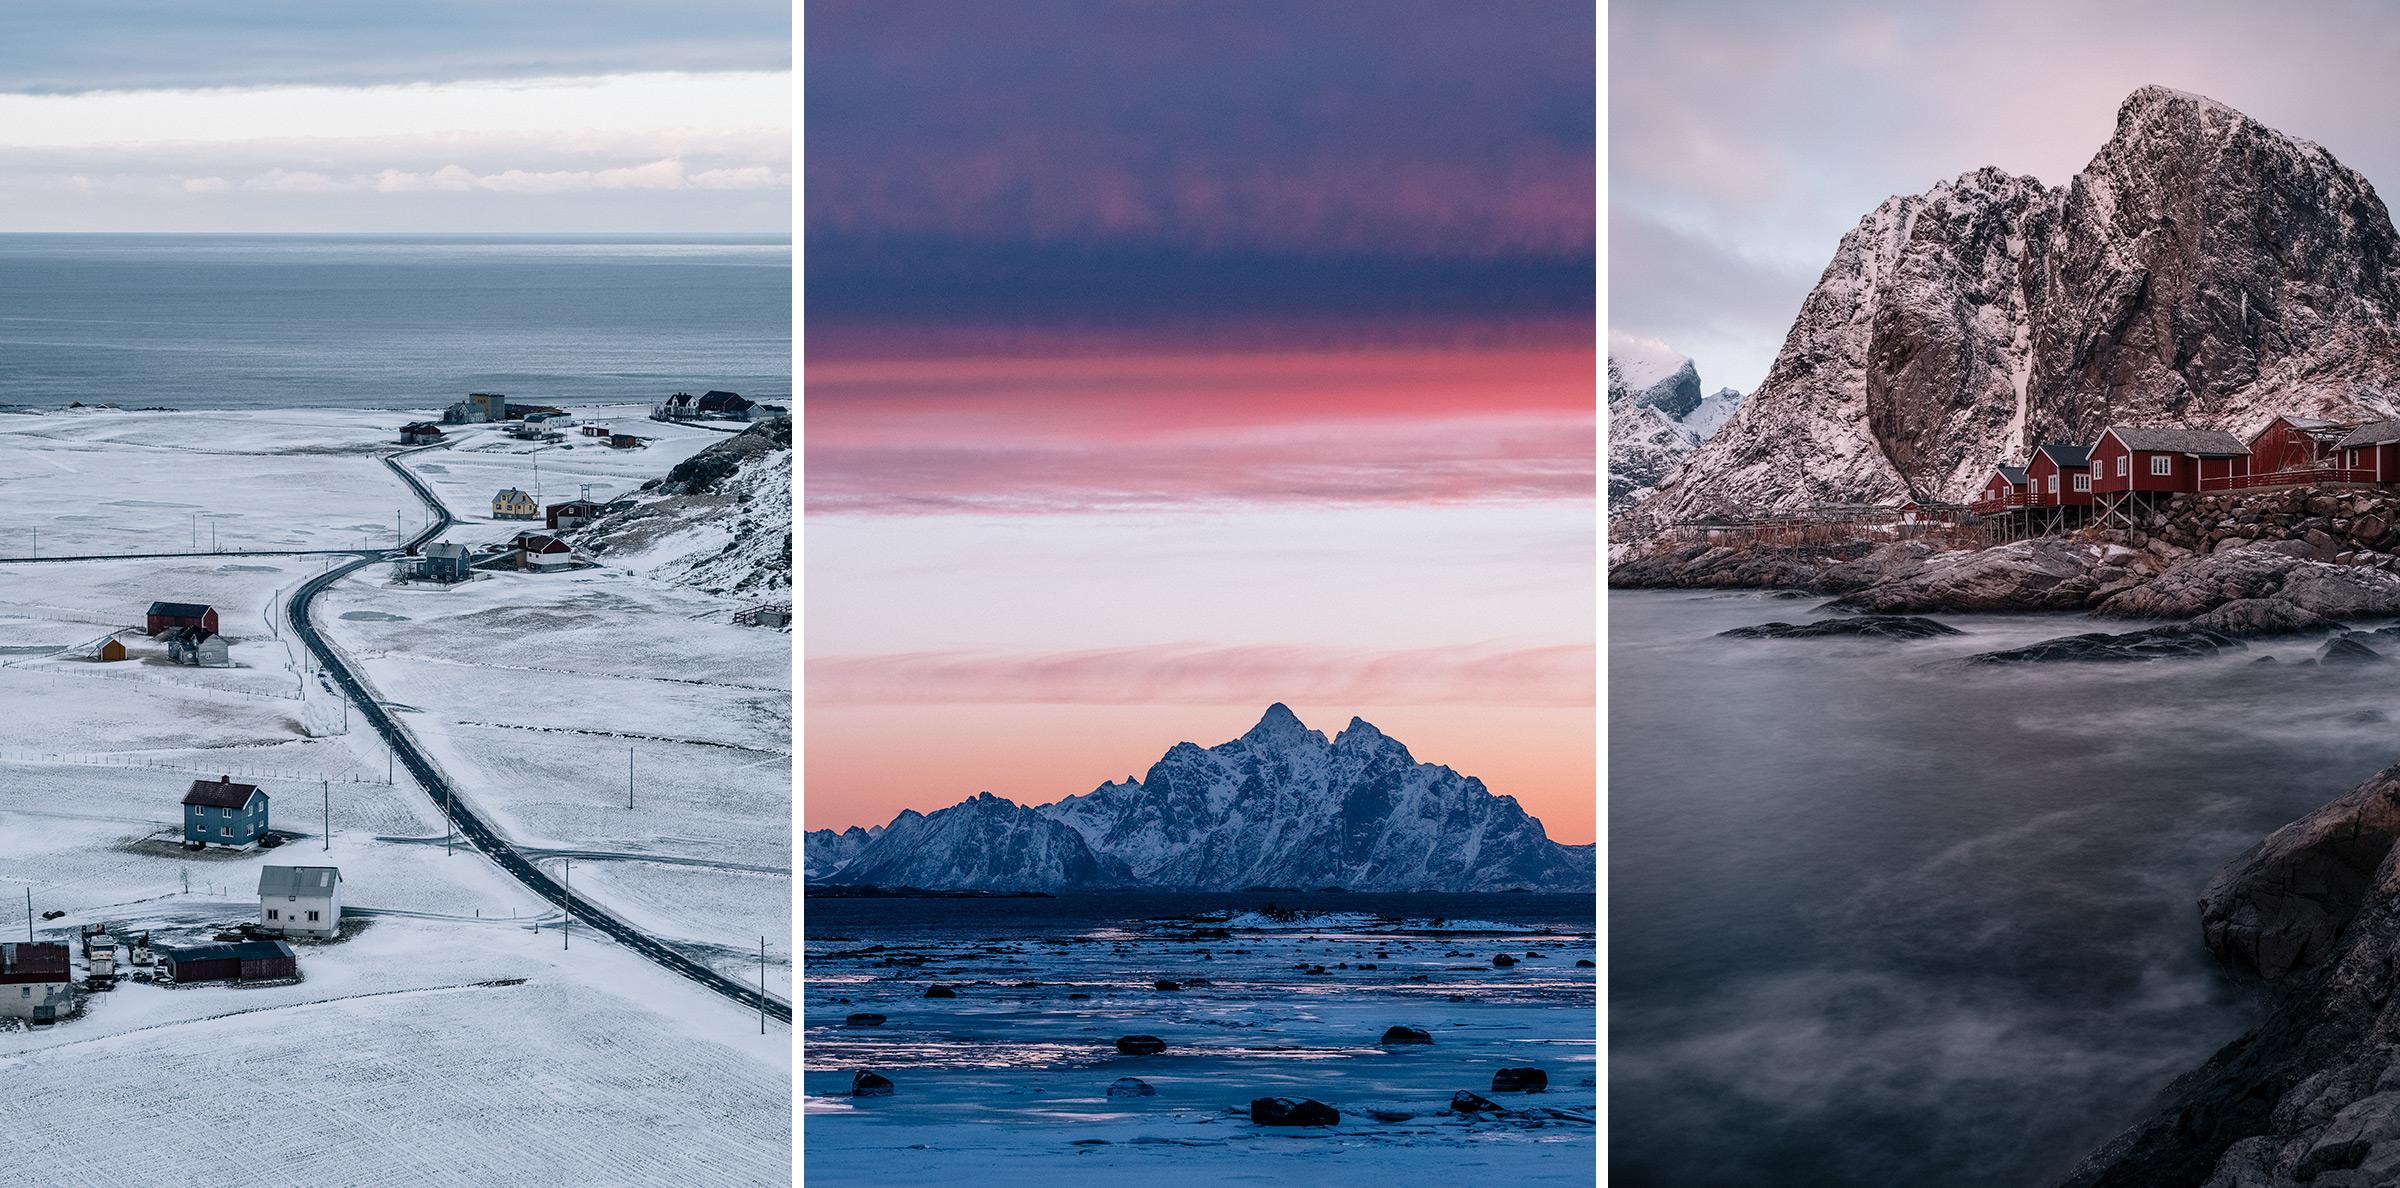 Fotoreise Nordische Momente - Lofoten Masterclass, Fotos: Martin Hülle